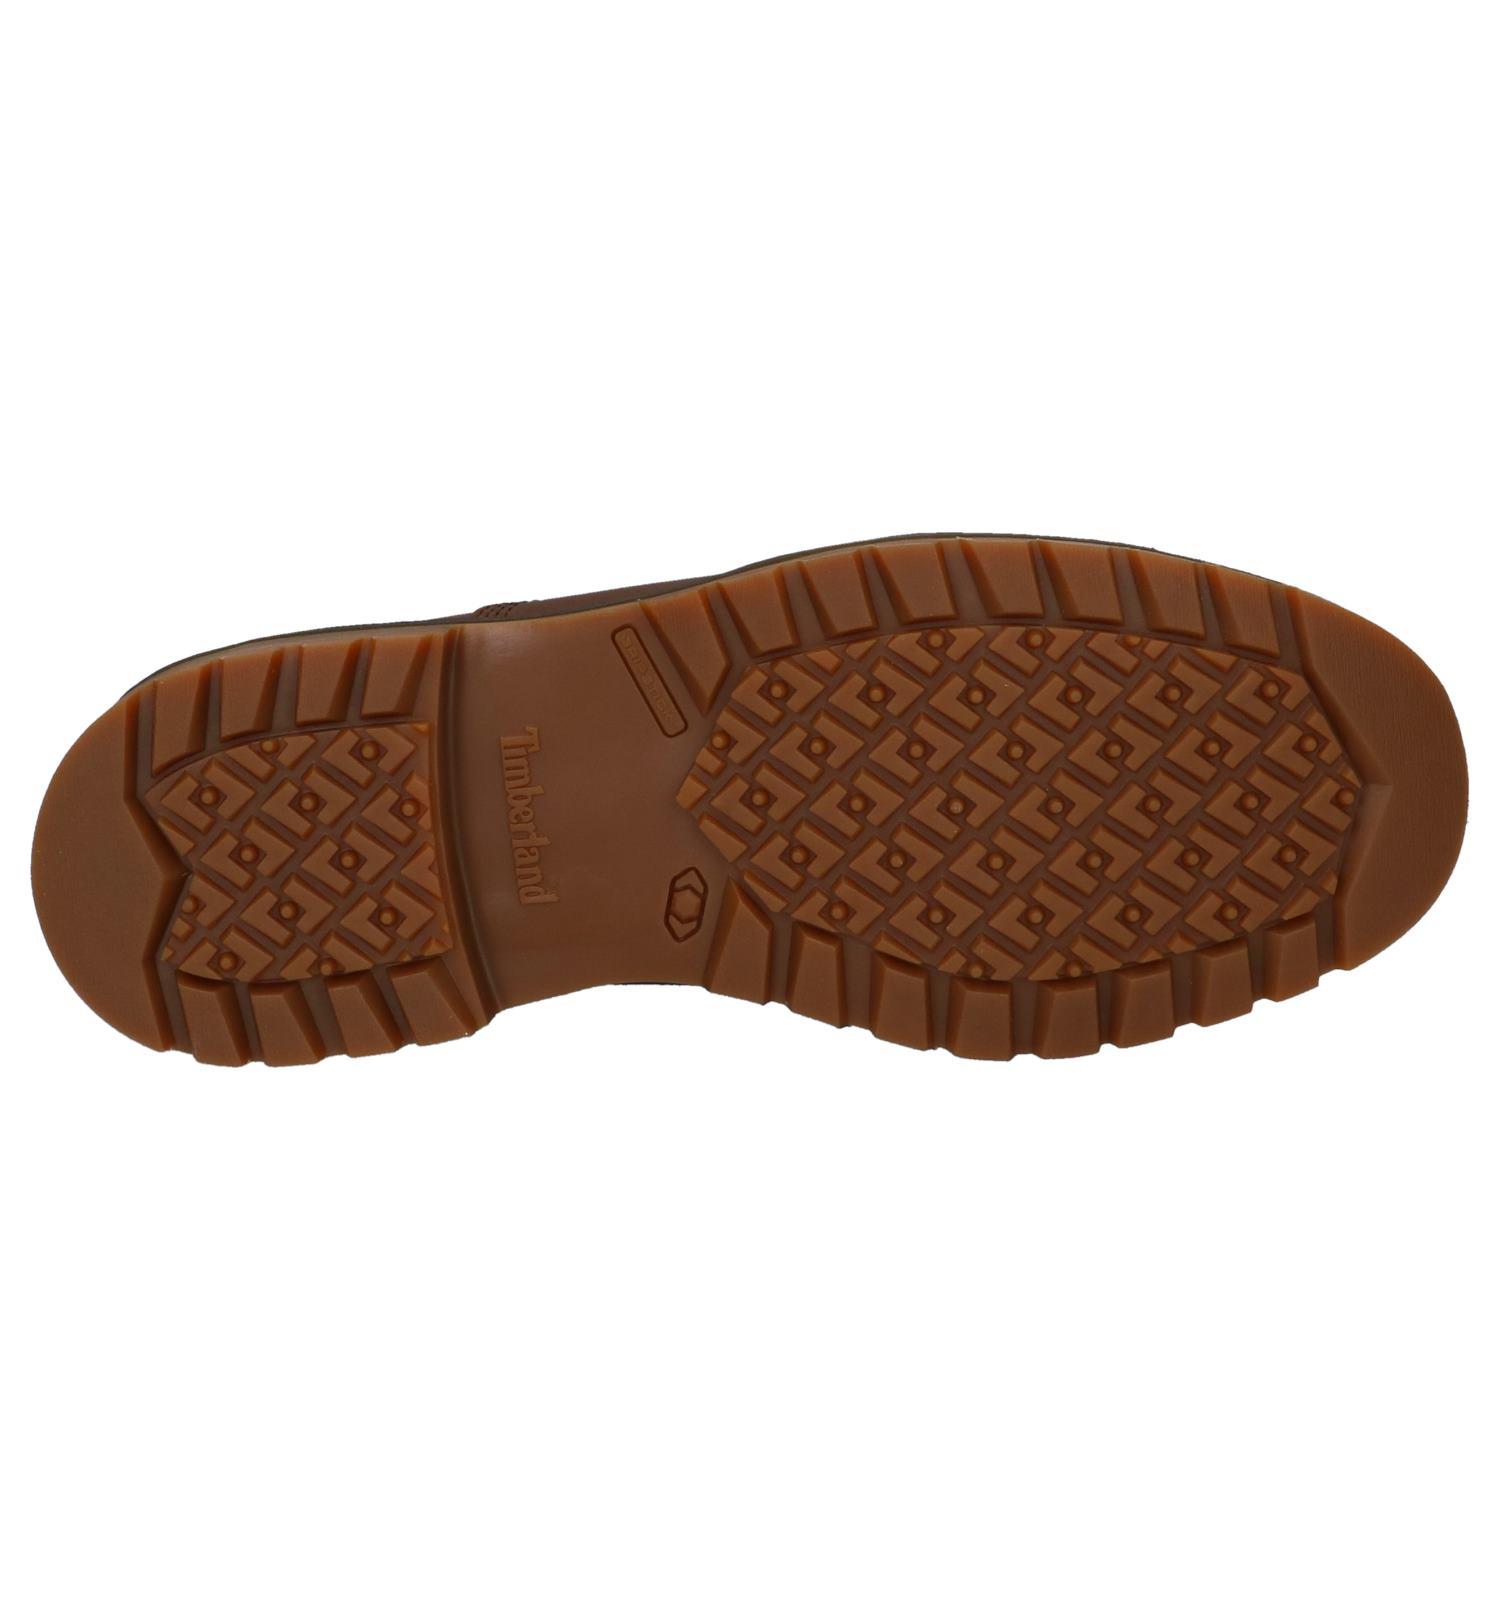 Timberland Larchmont Chukka Boots Timberland Bruine Bruine Boots m8v0Nnw